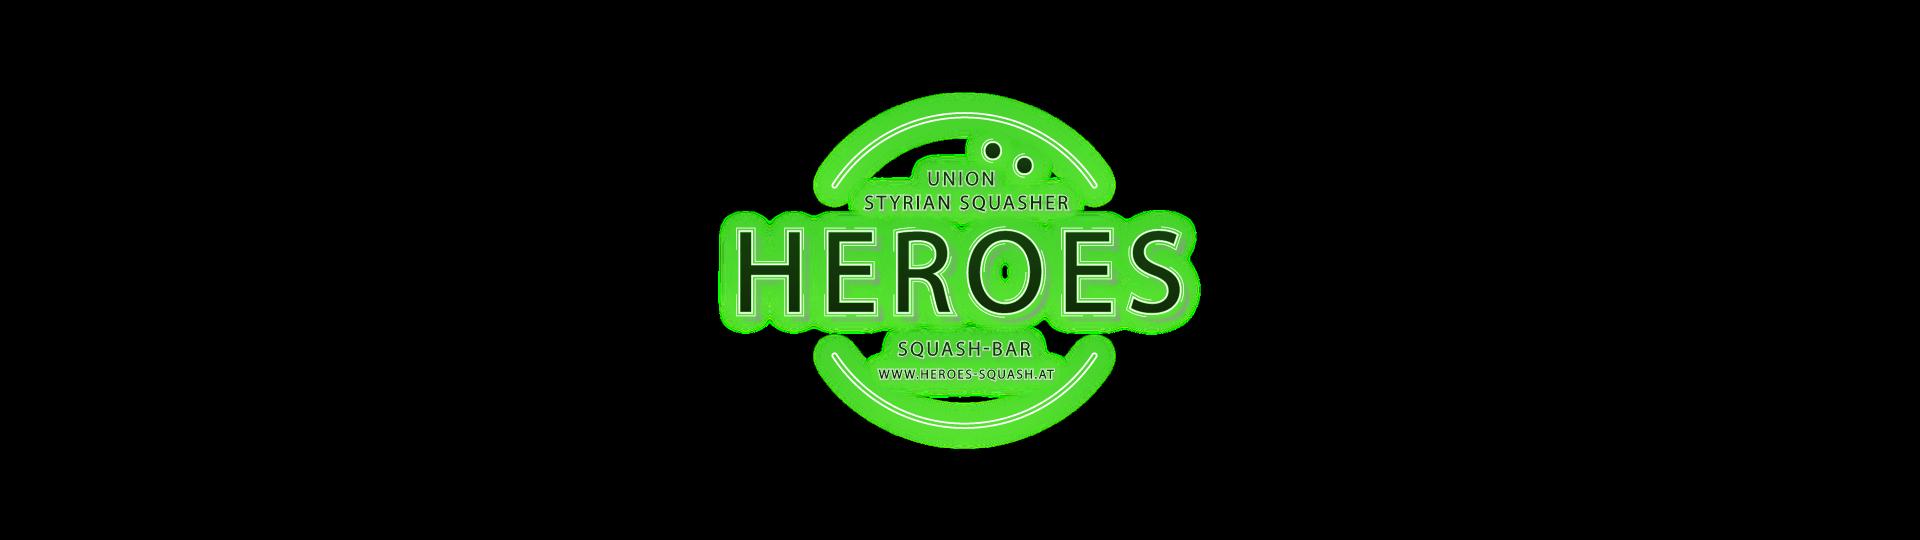 logo-coverphoto-background